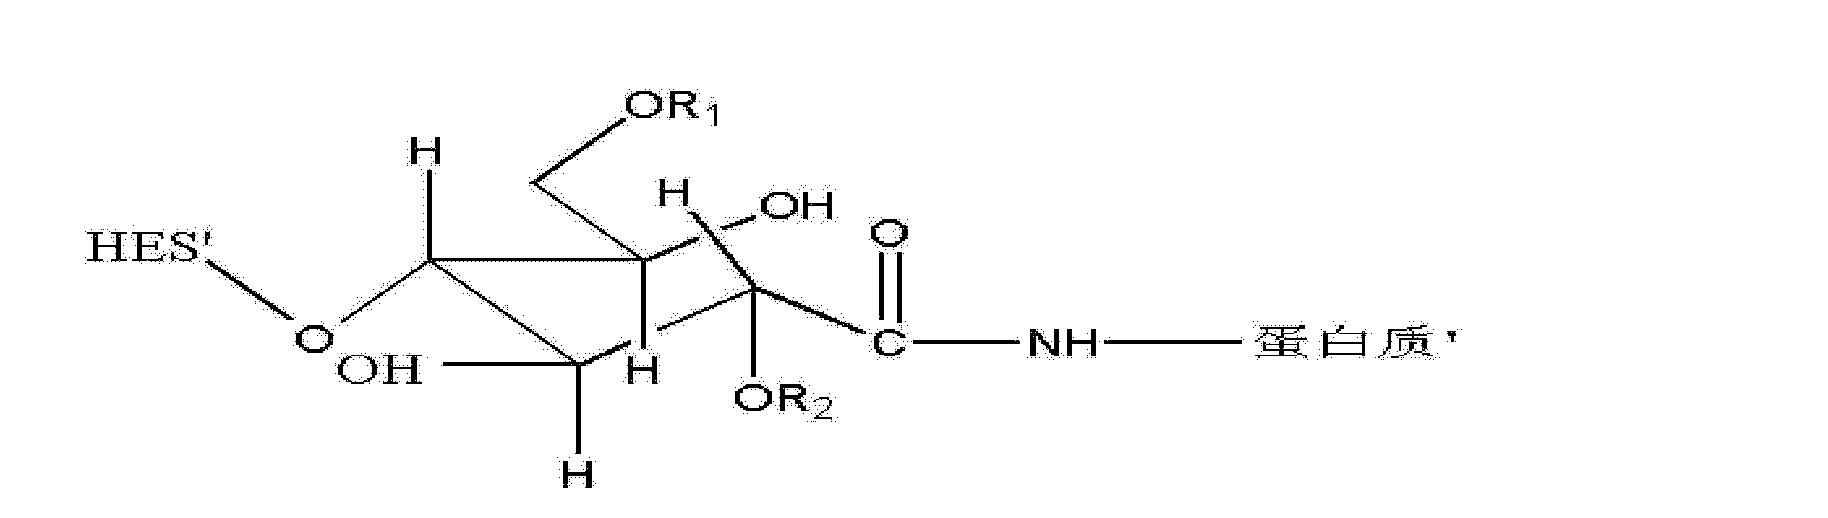 Figure CN104072608AD00031